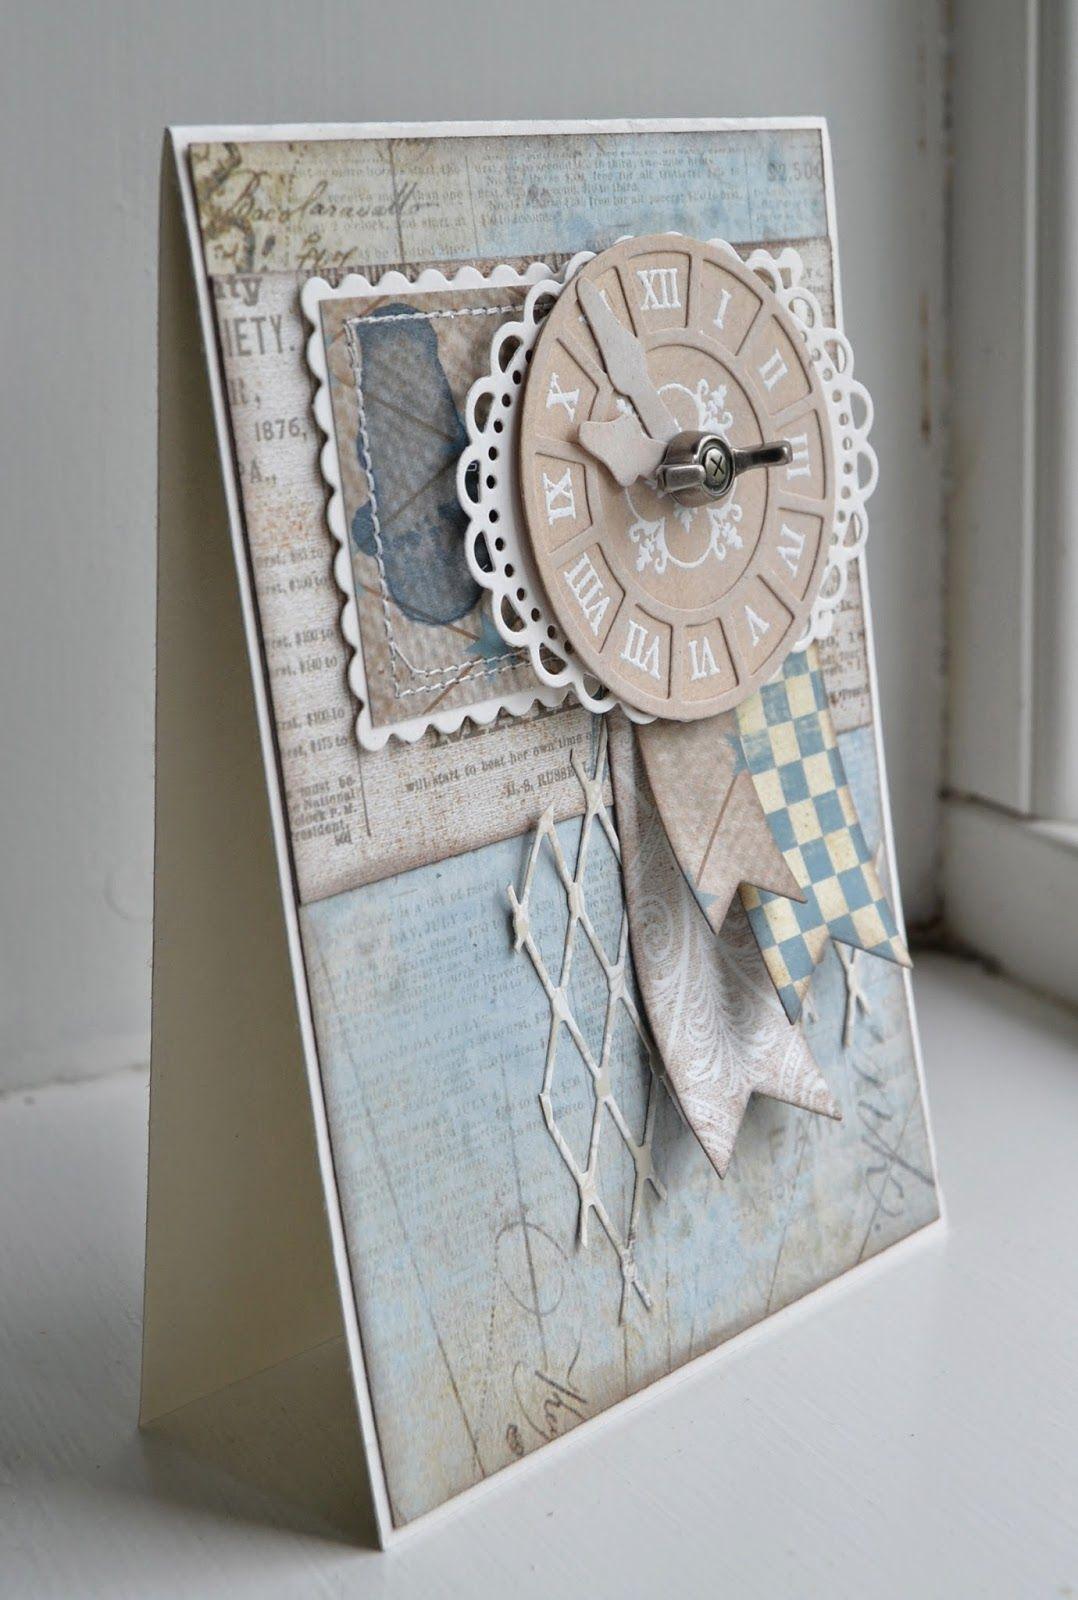 Riddersholm Design ⊱✿-✿⊰ Follow the Cards board. Visit GrannyEnchanted.Com for thousands of digital scrapbook freebies. ⊱✿-✿⊰  1